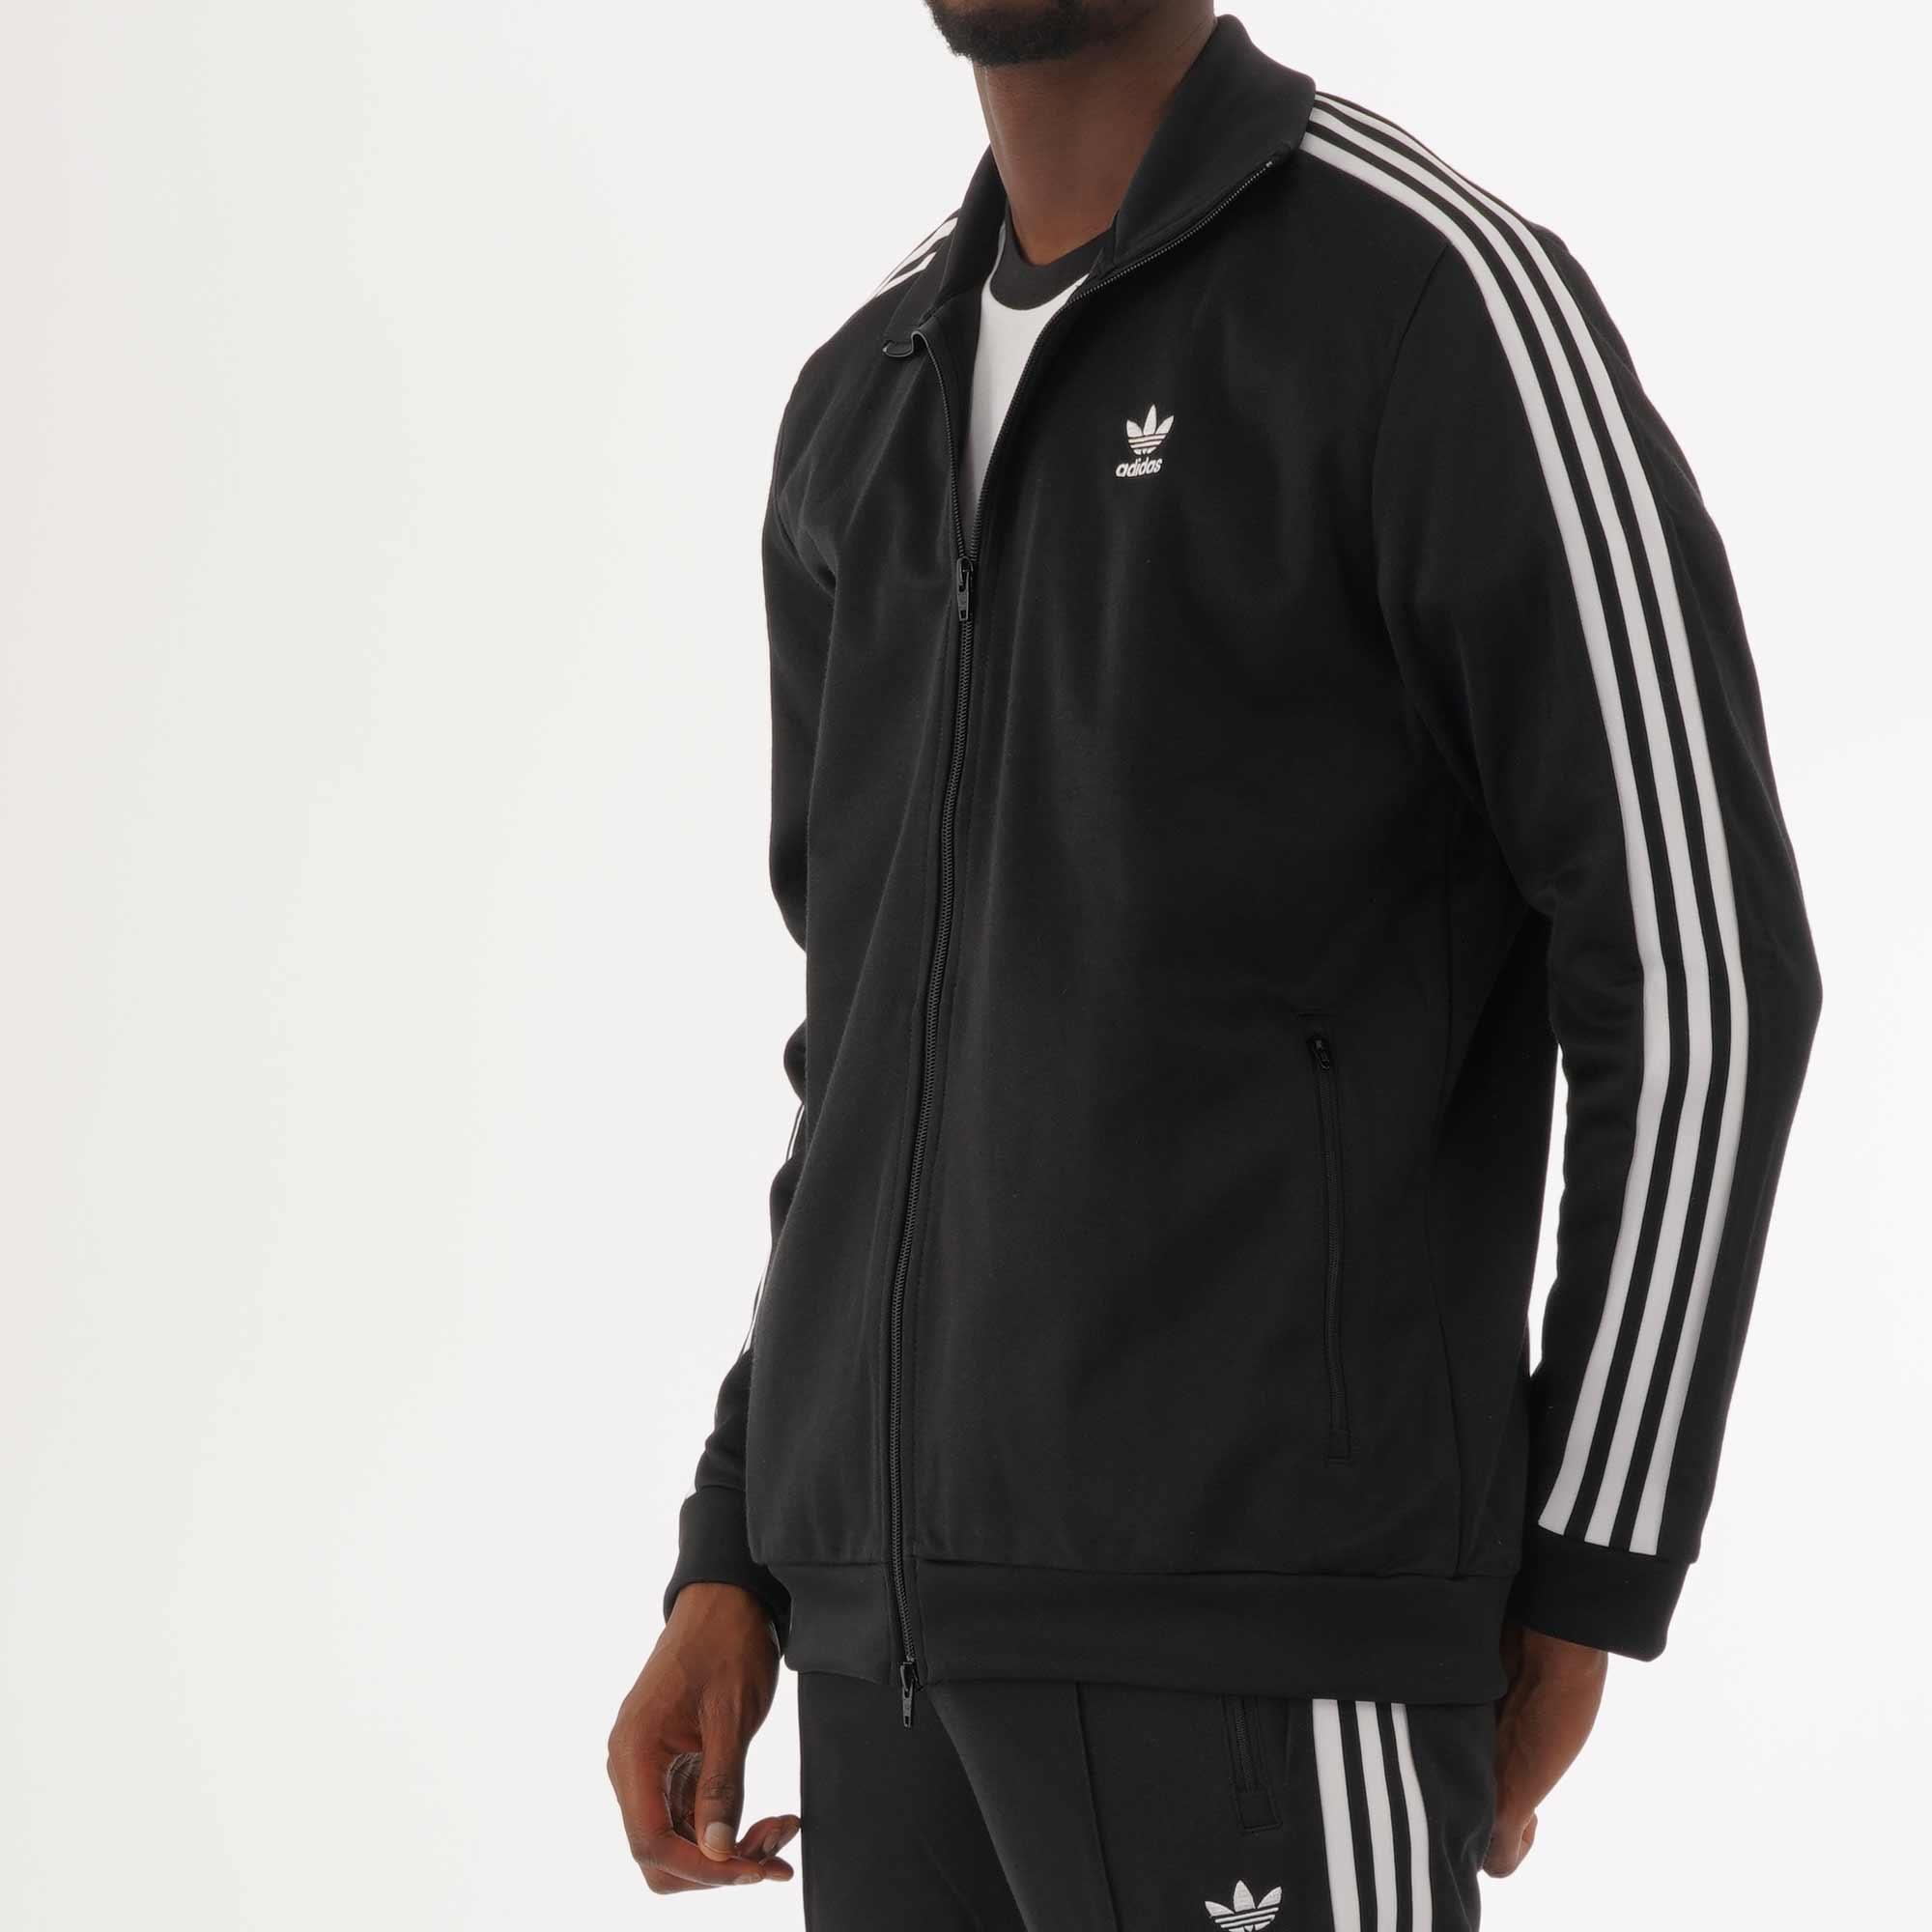 adidas Originals Black Beckenbauer Jacket